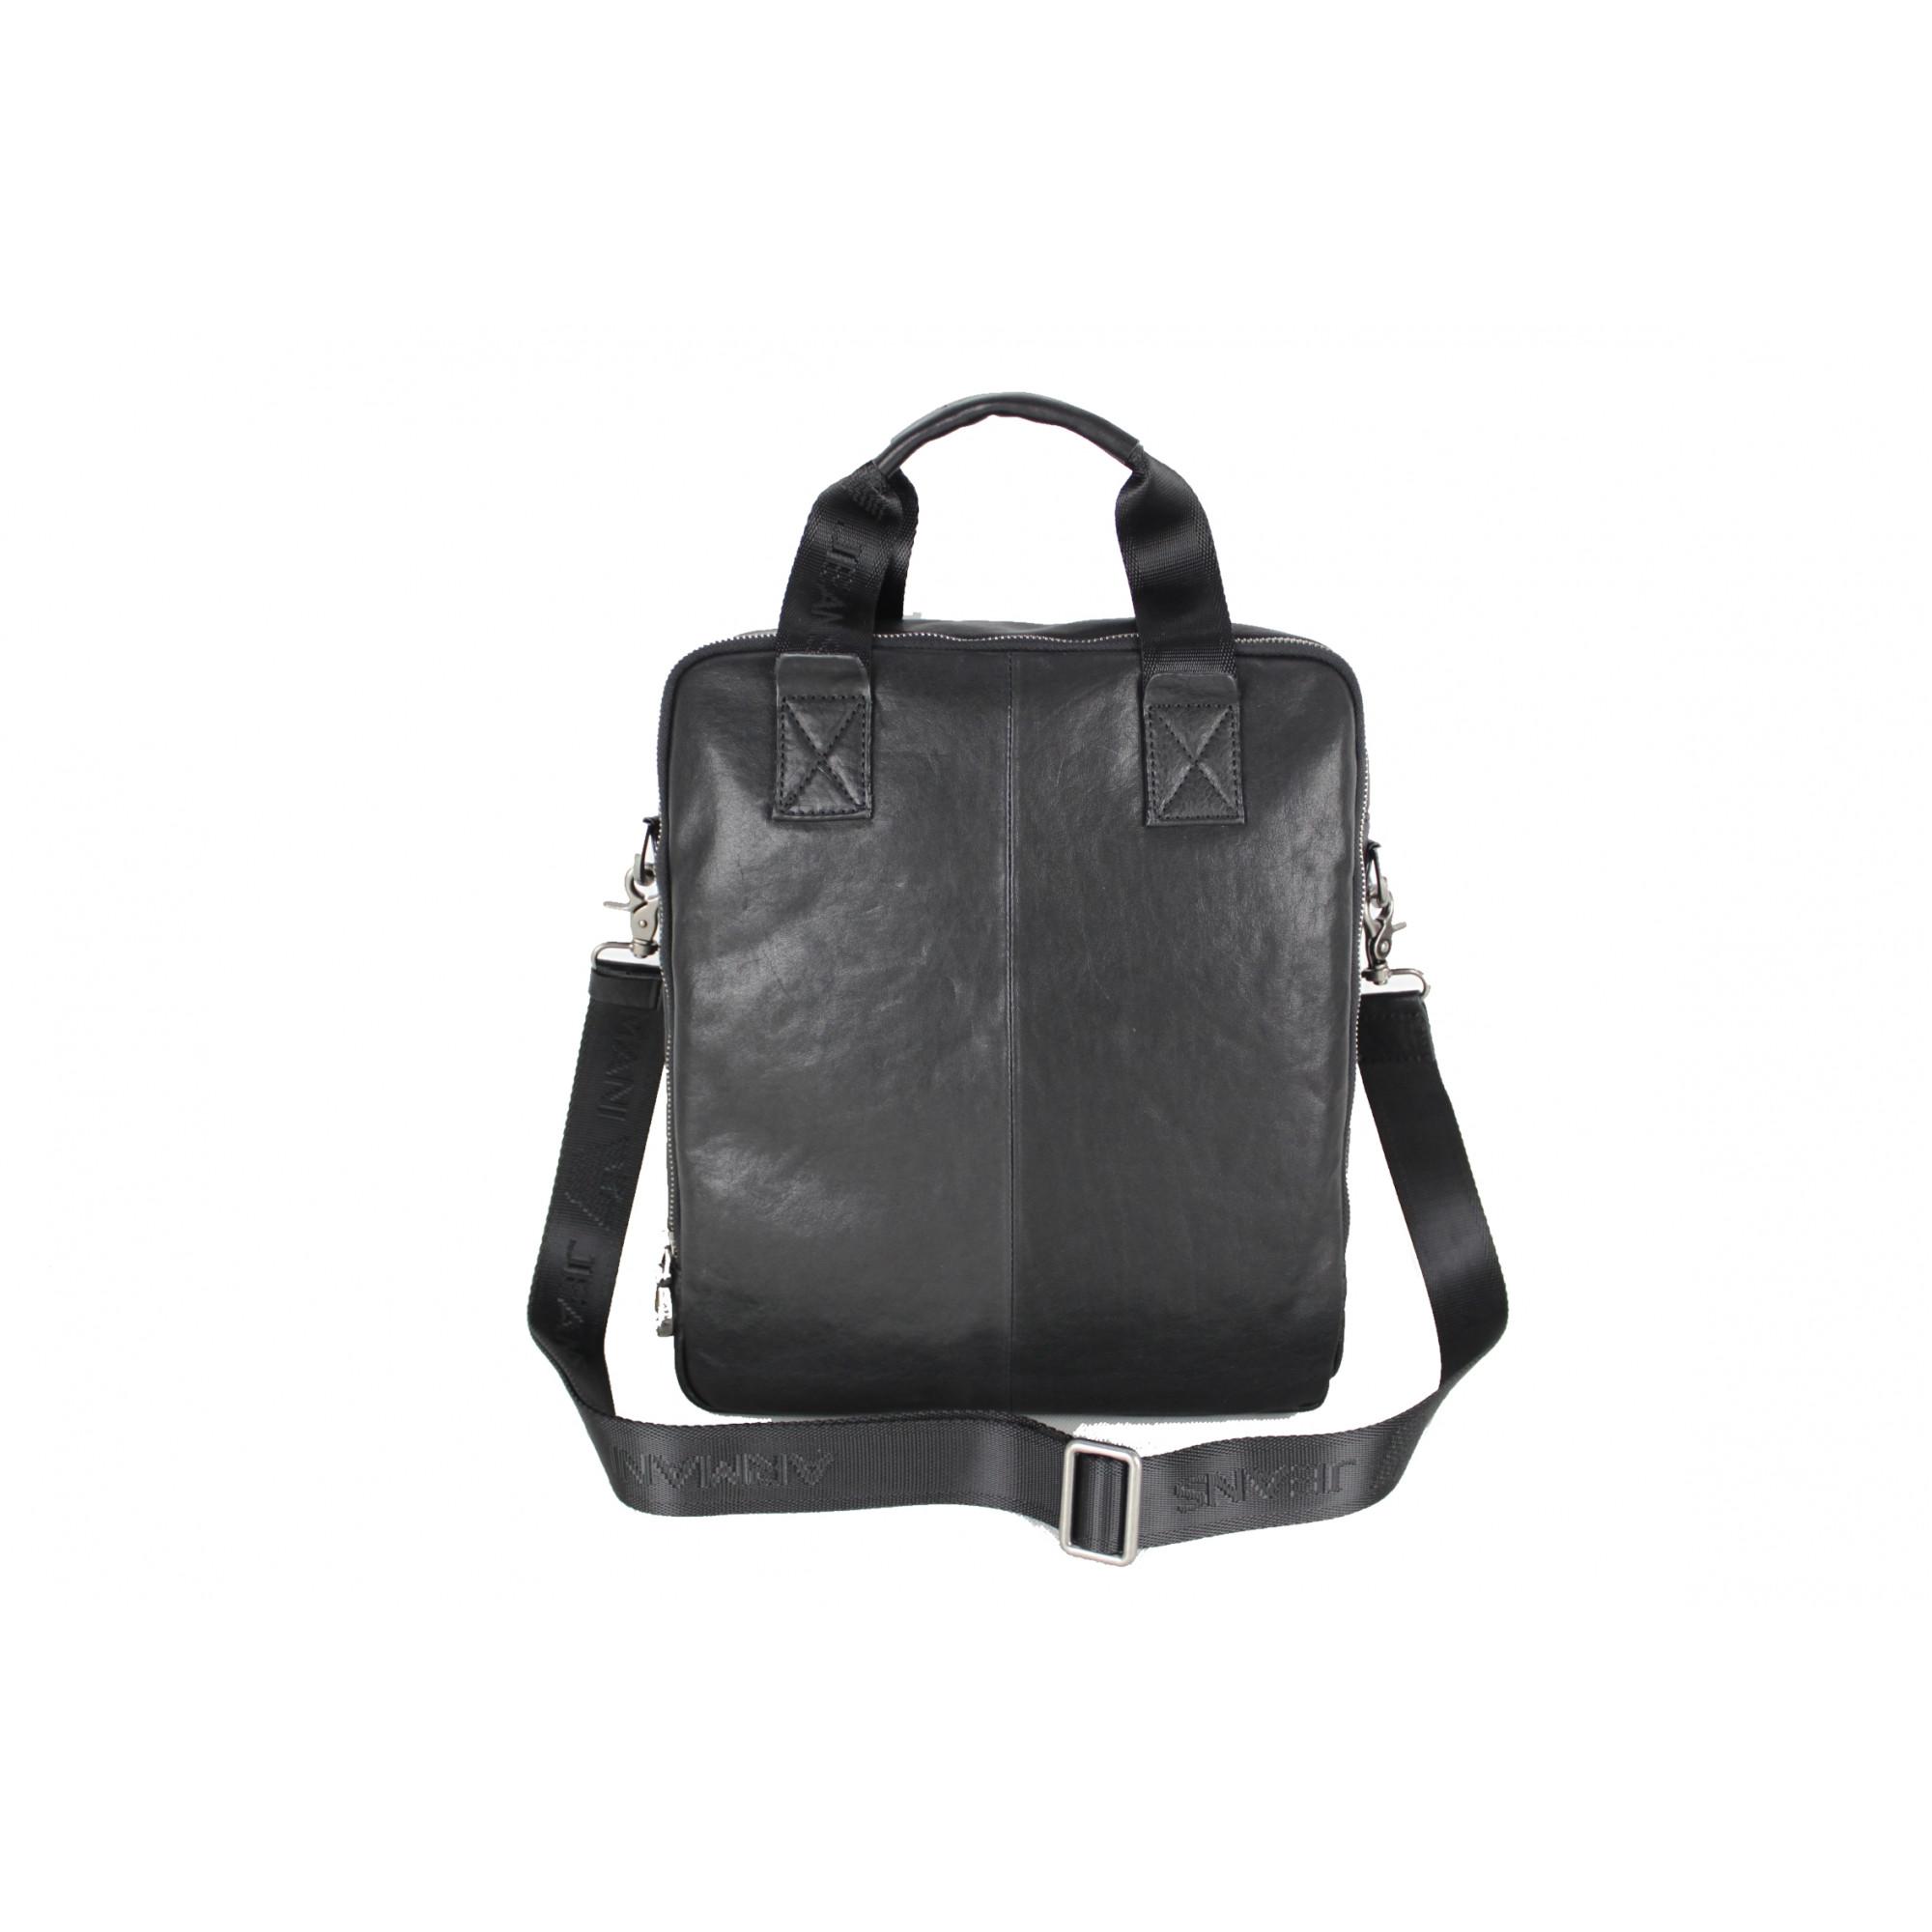 Мужская сумка от Armani Jeans  купить мужские сумки в интернет ... 7b051207d0c